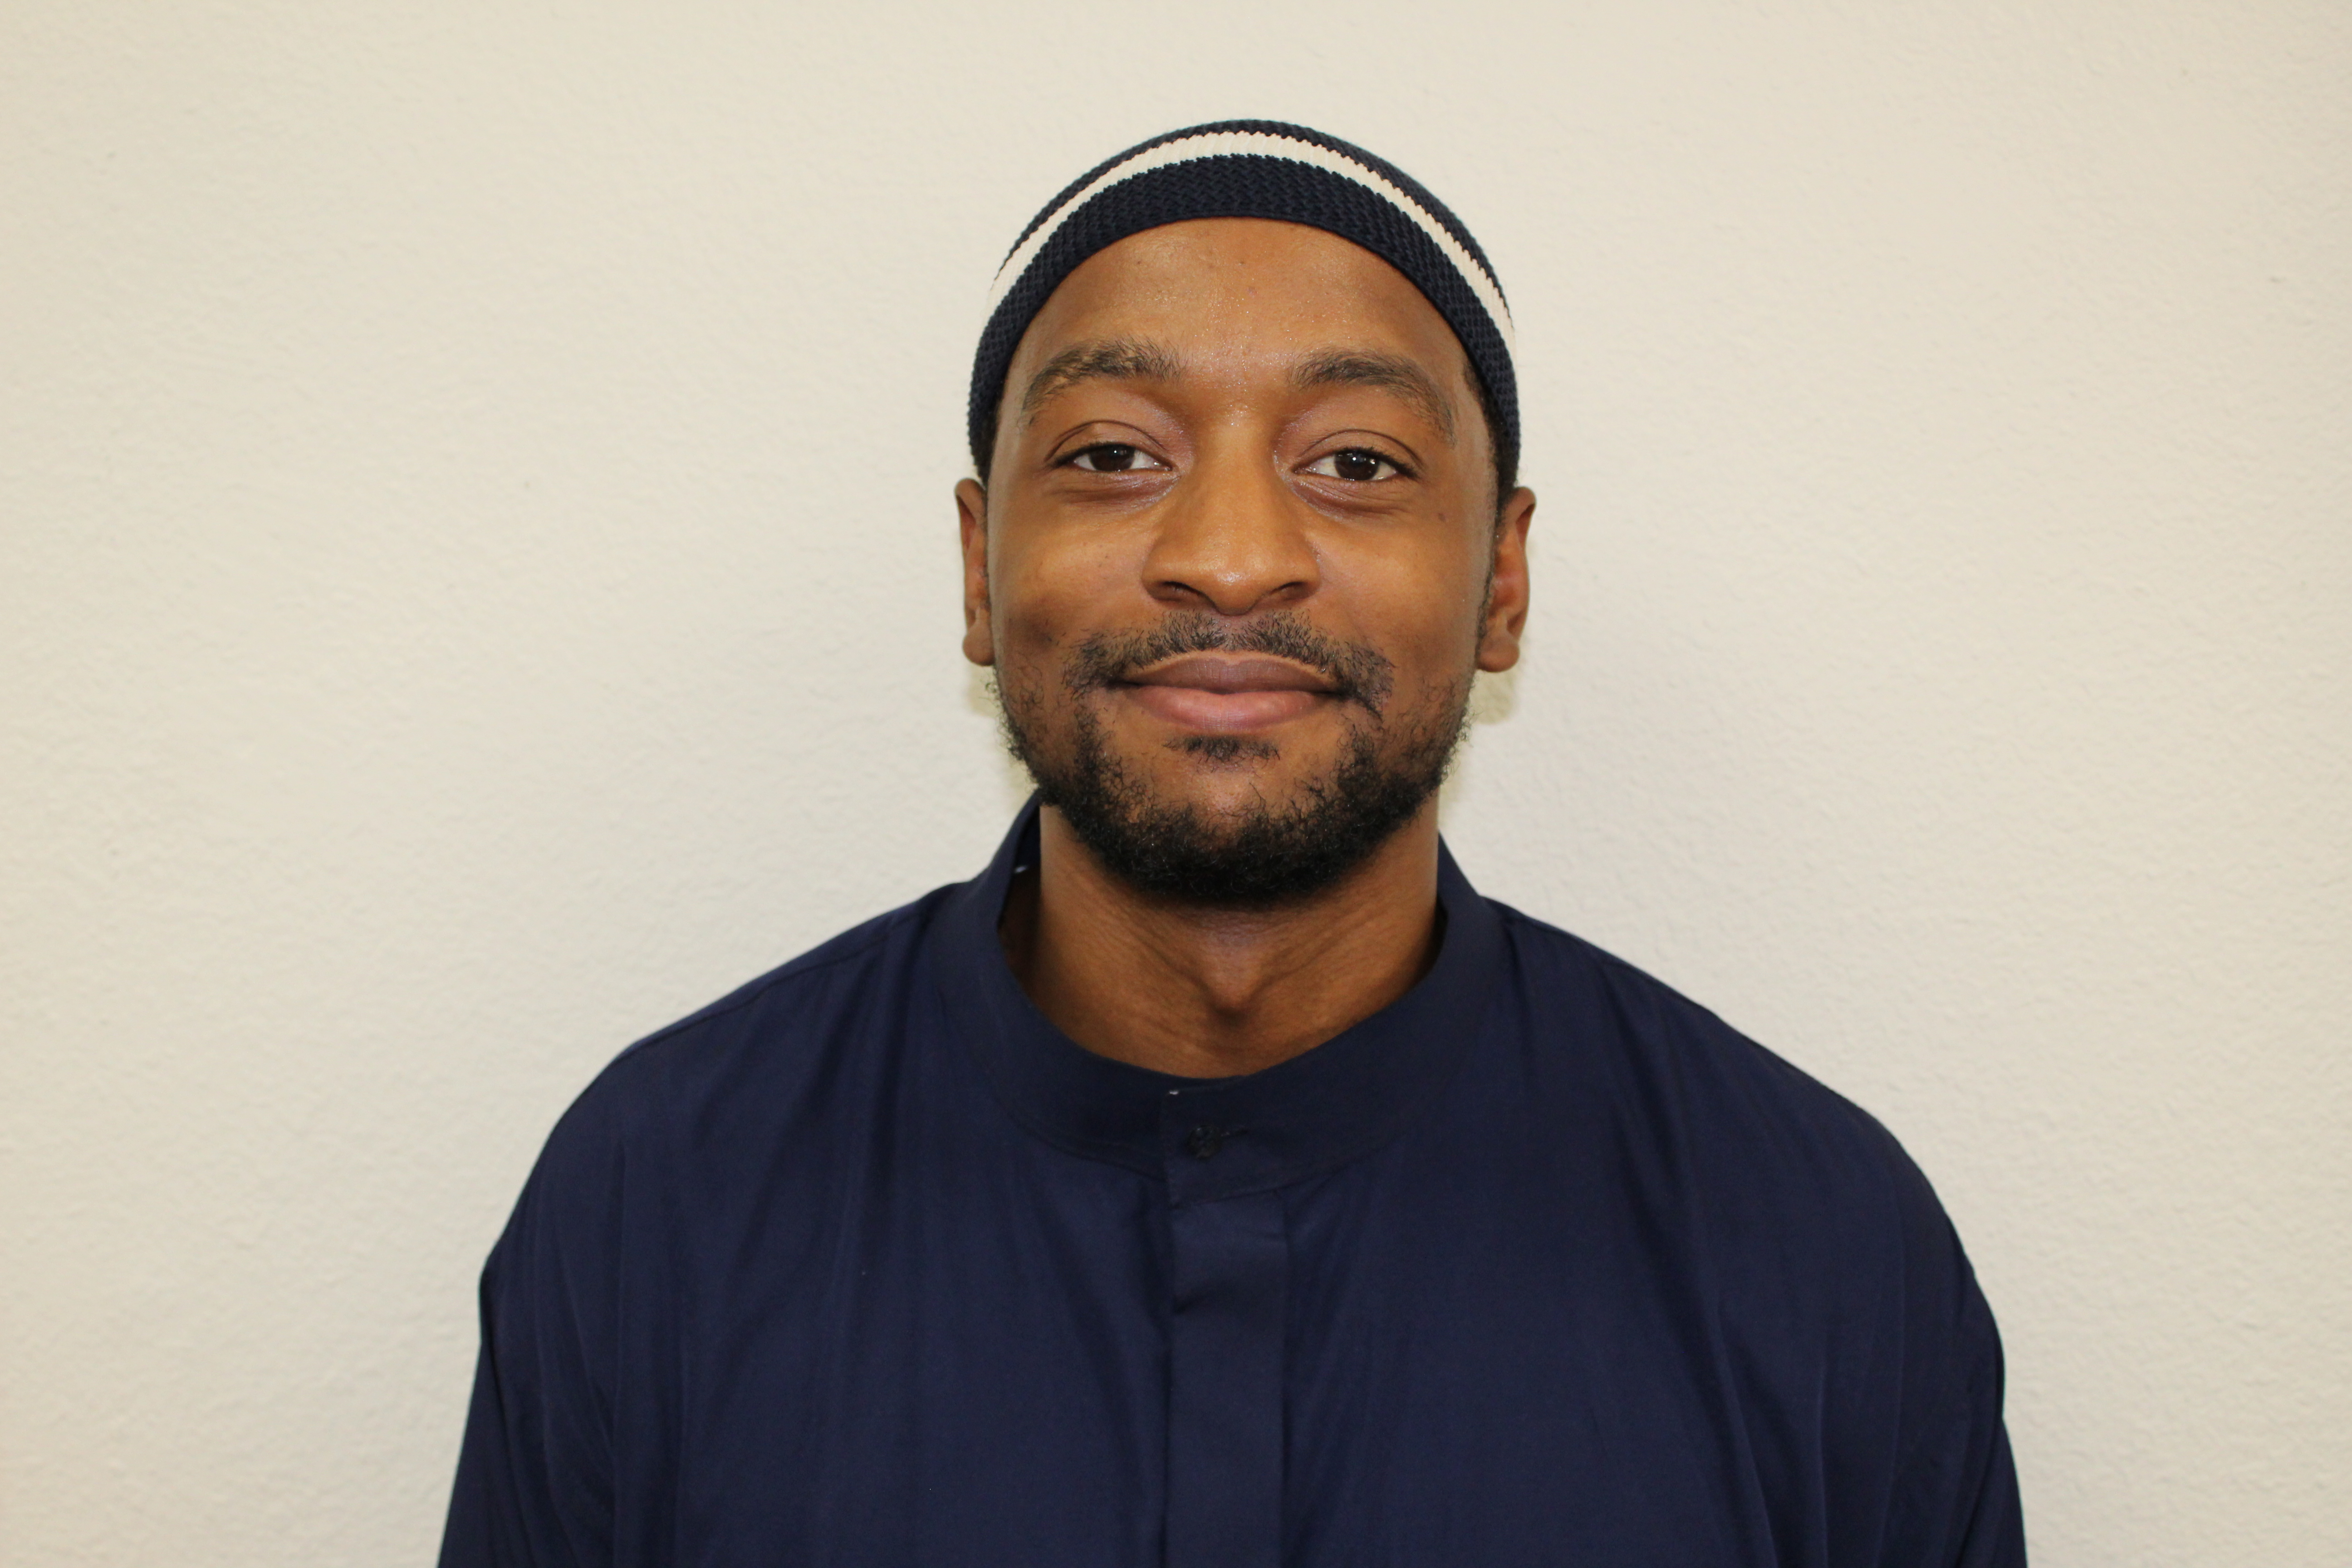 Abdul Malik Muhammad